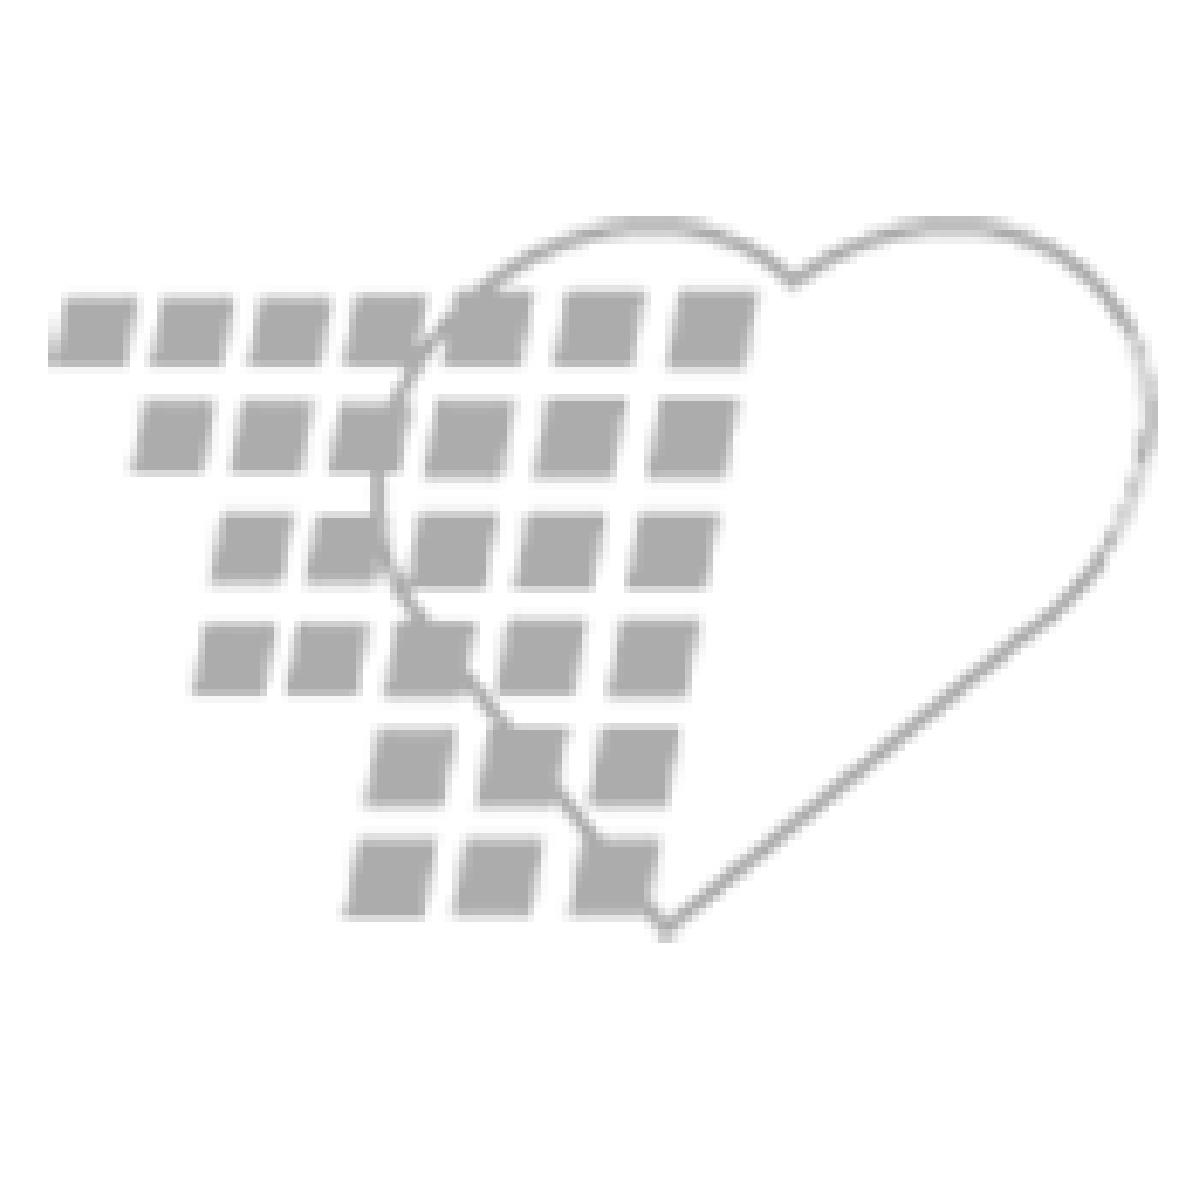 06-93-9001 - Demo Dose Levaqun (Levofloxacn) 20 mL 25mg/mL